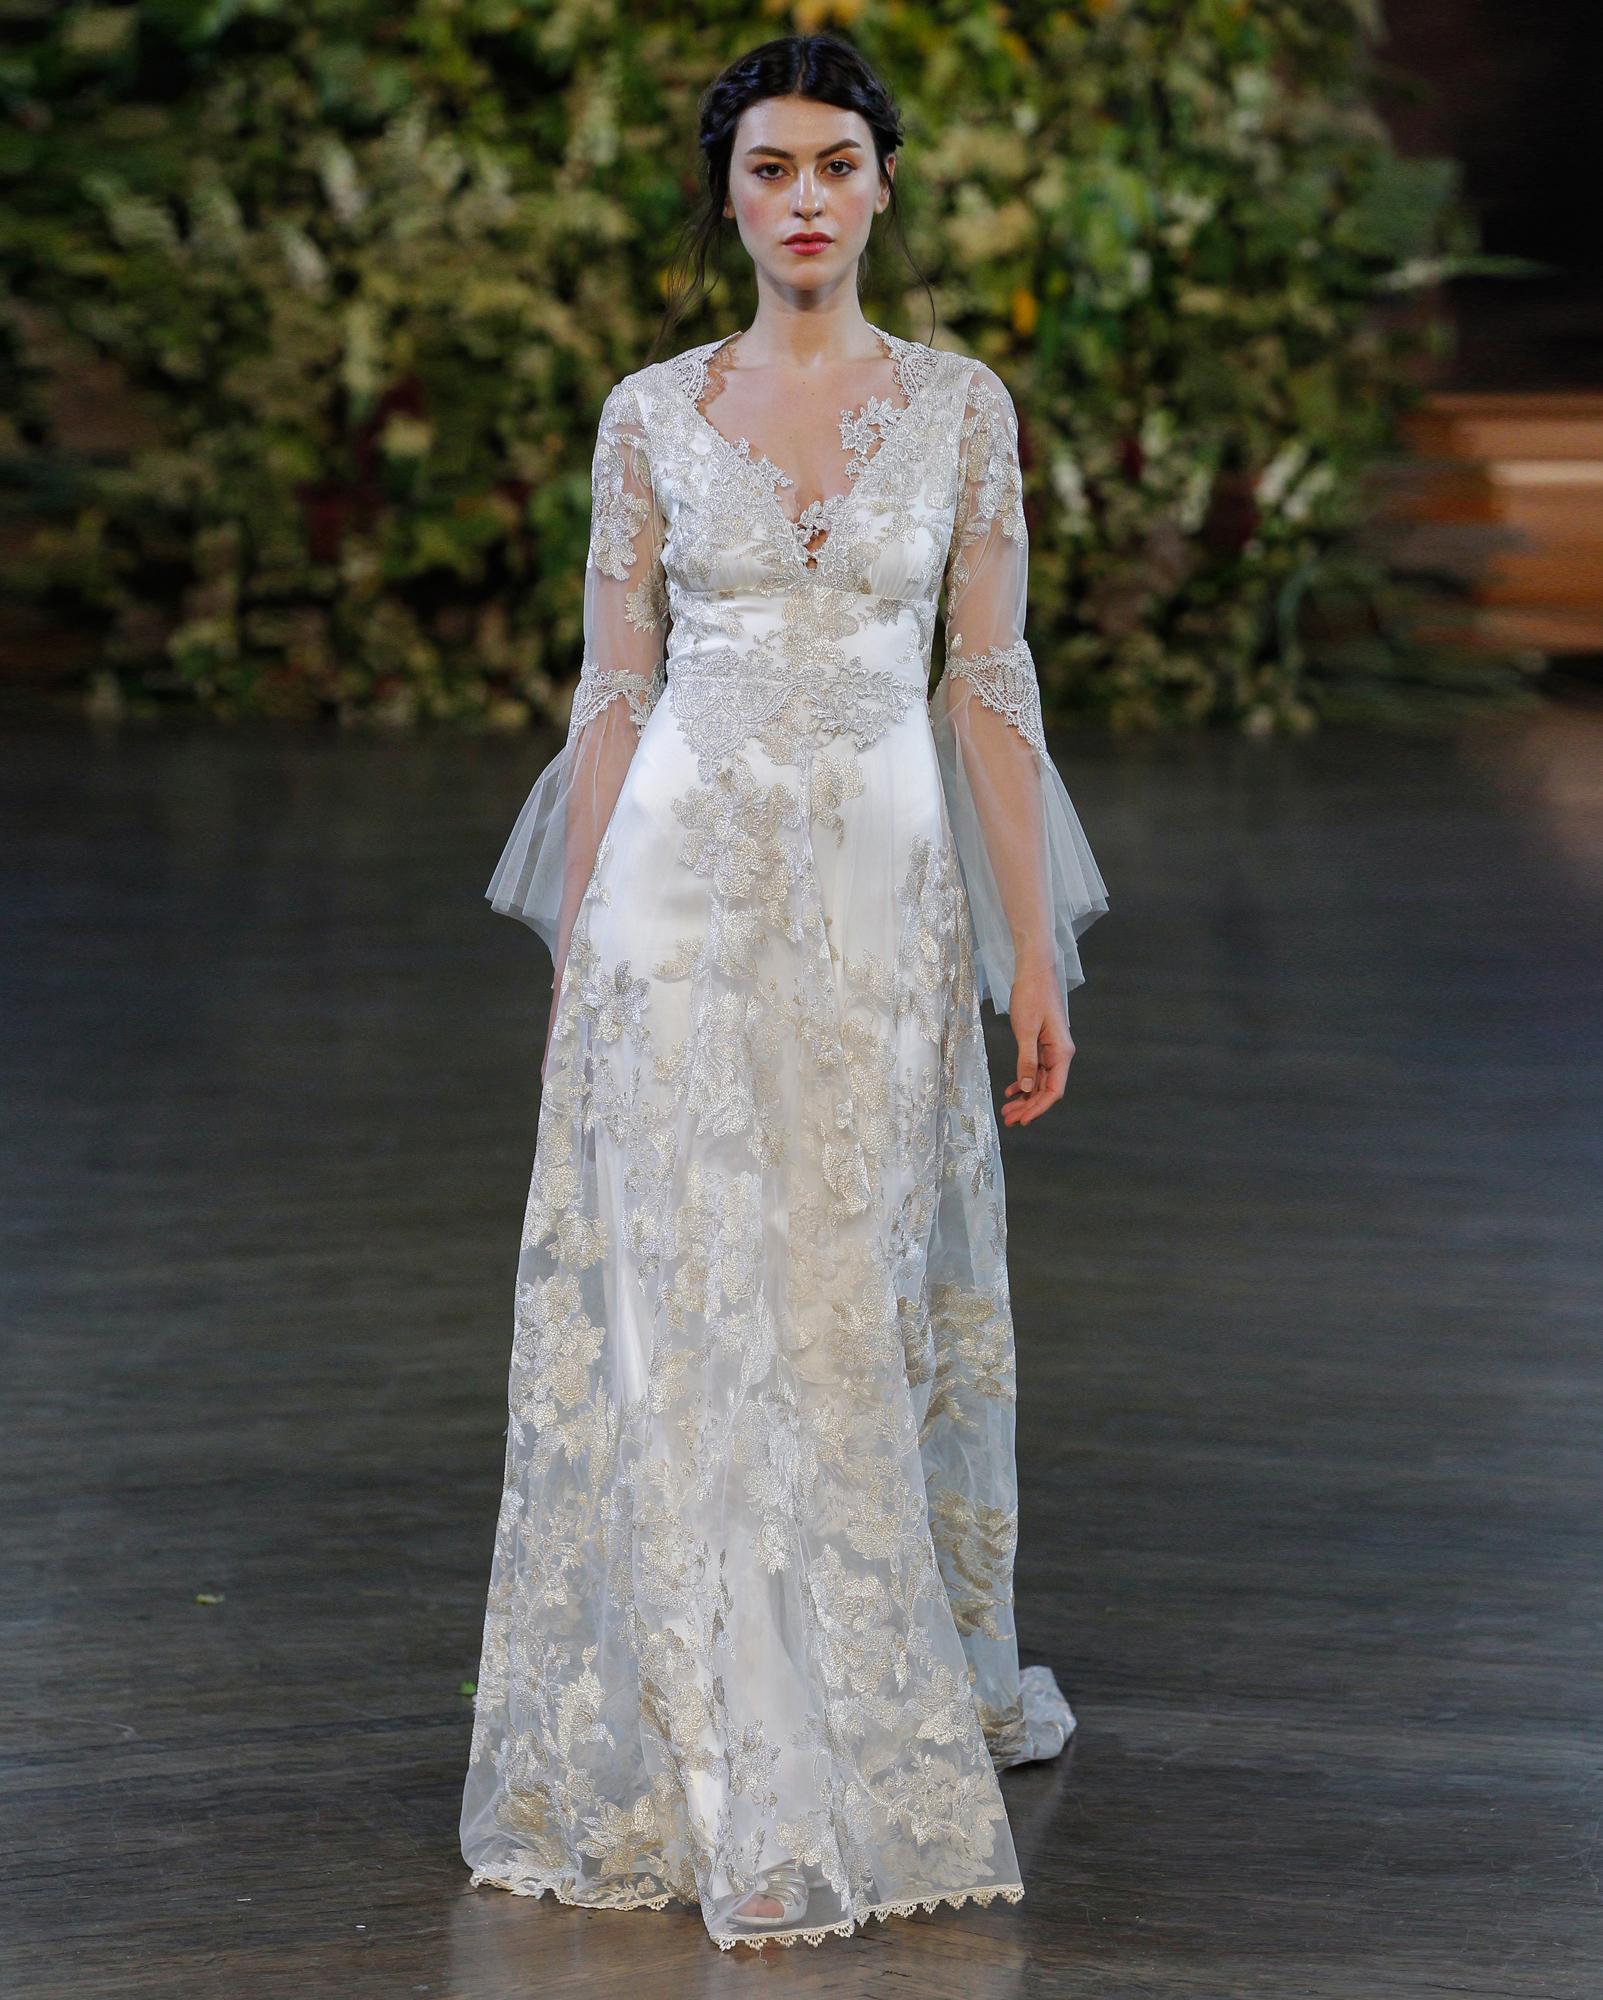 50-states-wedding-dresses-oregon-claire-pettibone-0615.jpg